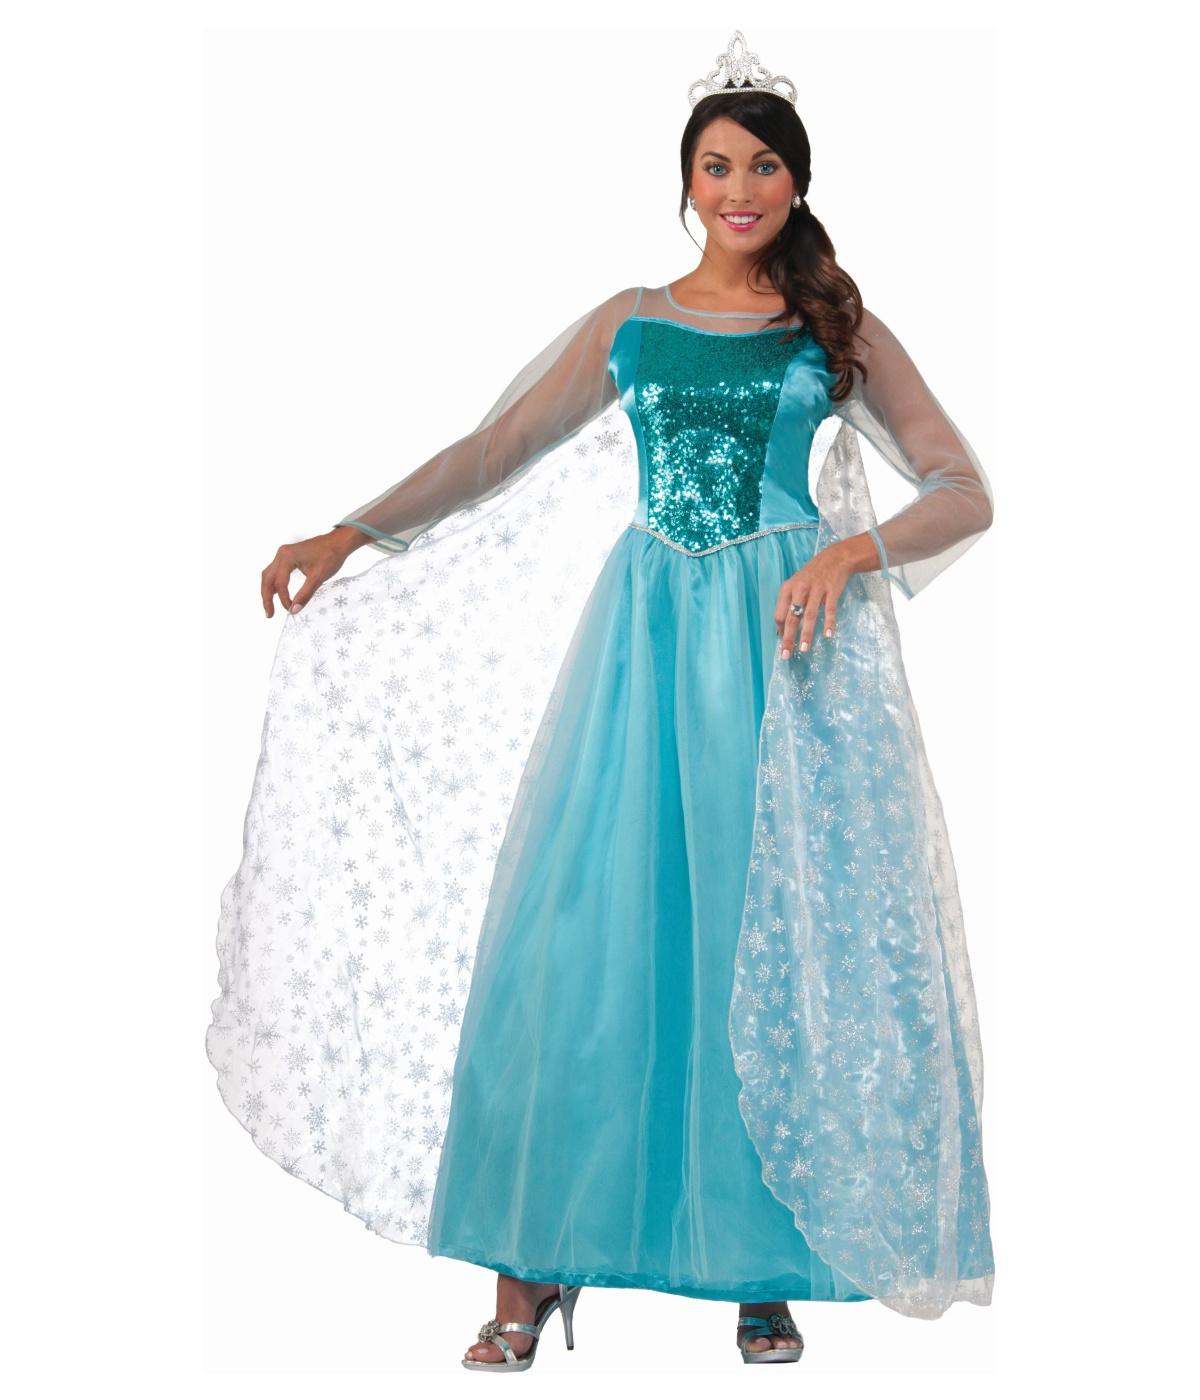 krystal ice princess womens costume princess costumes